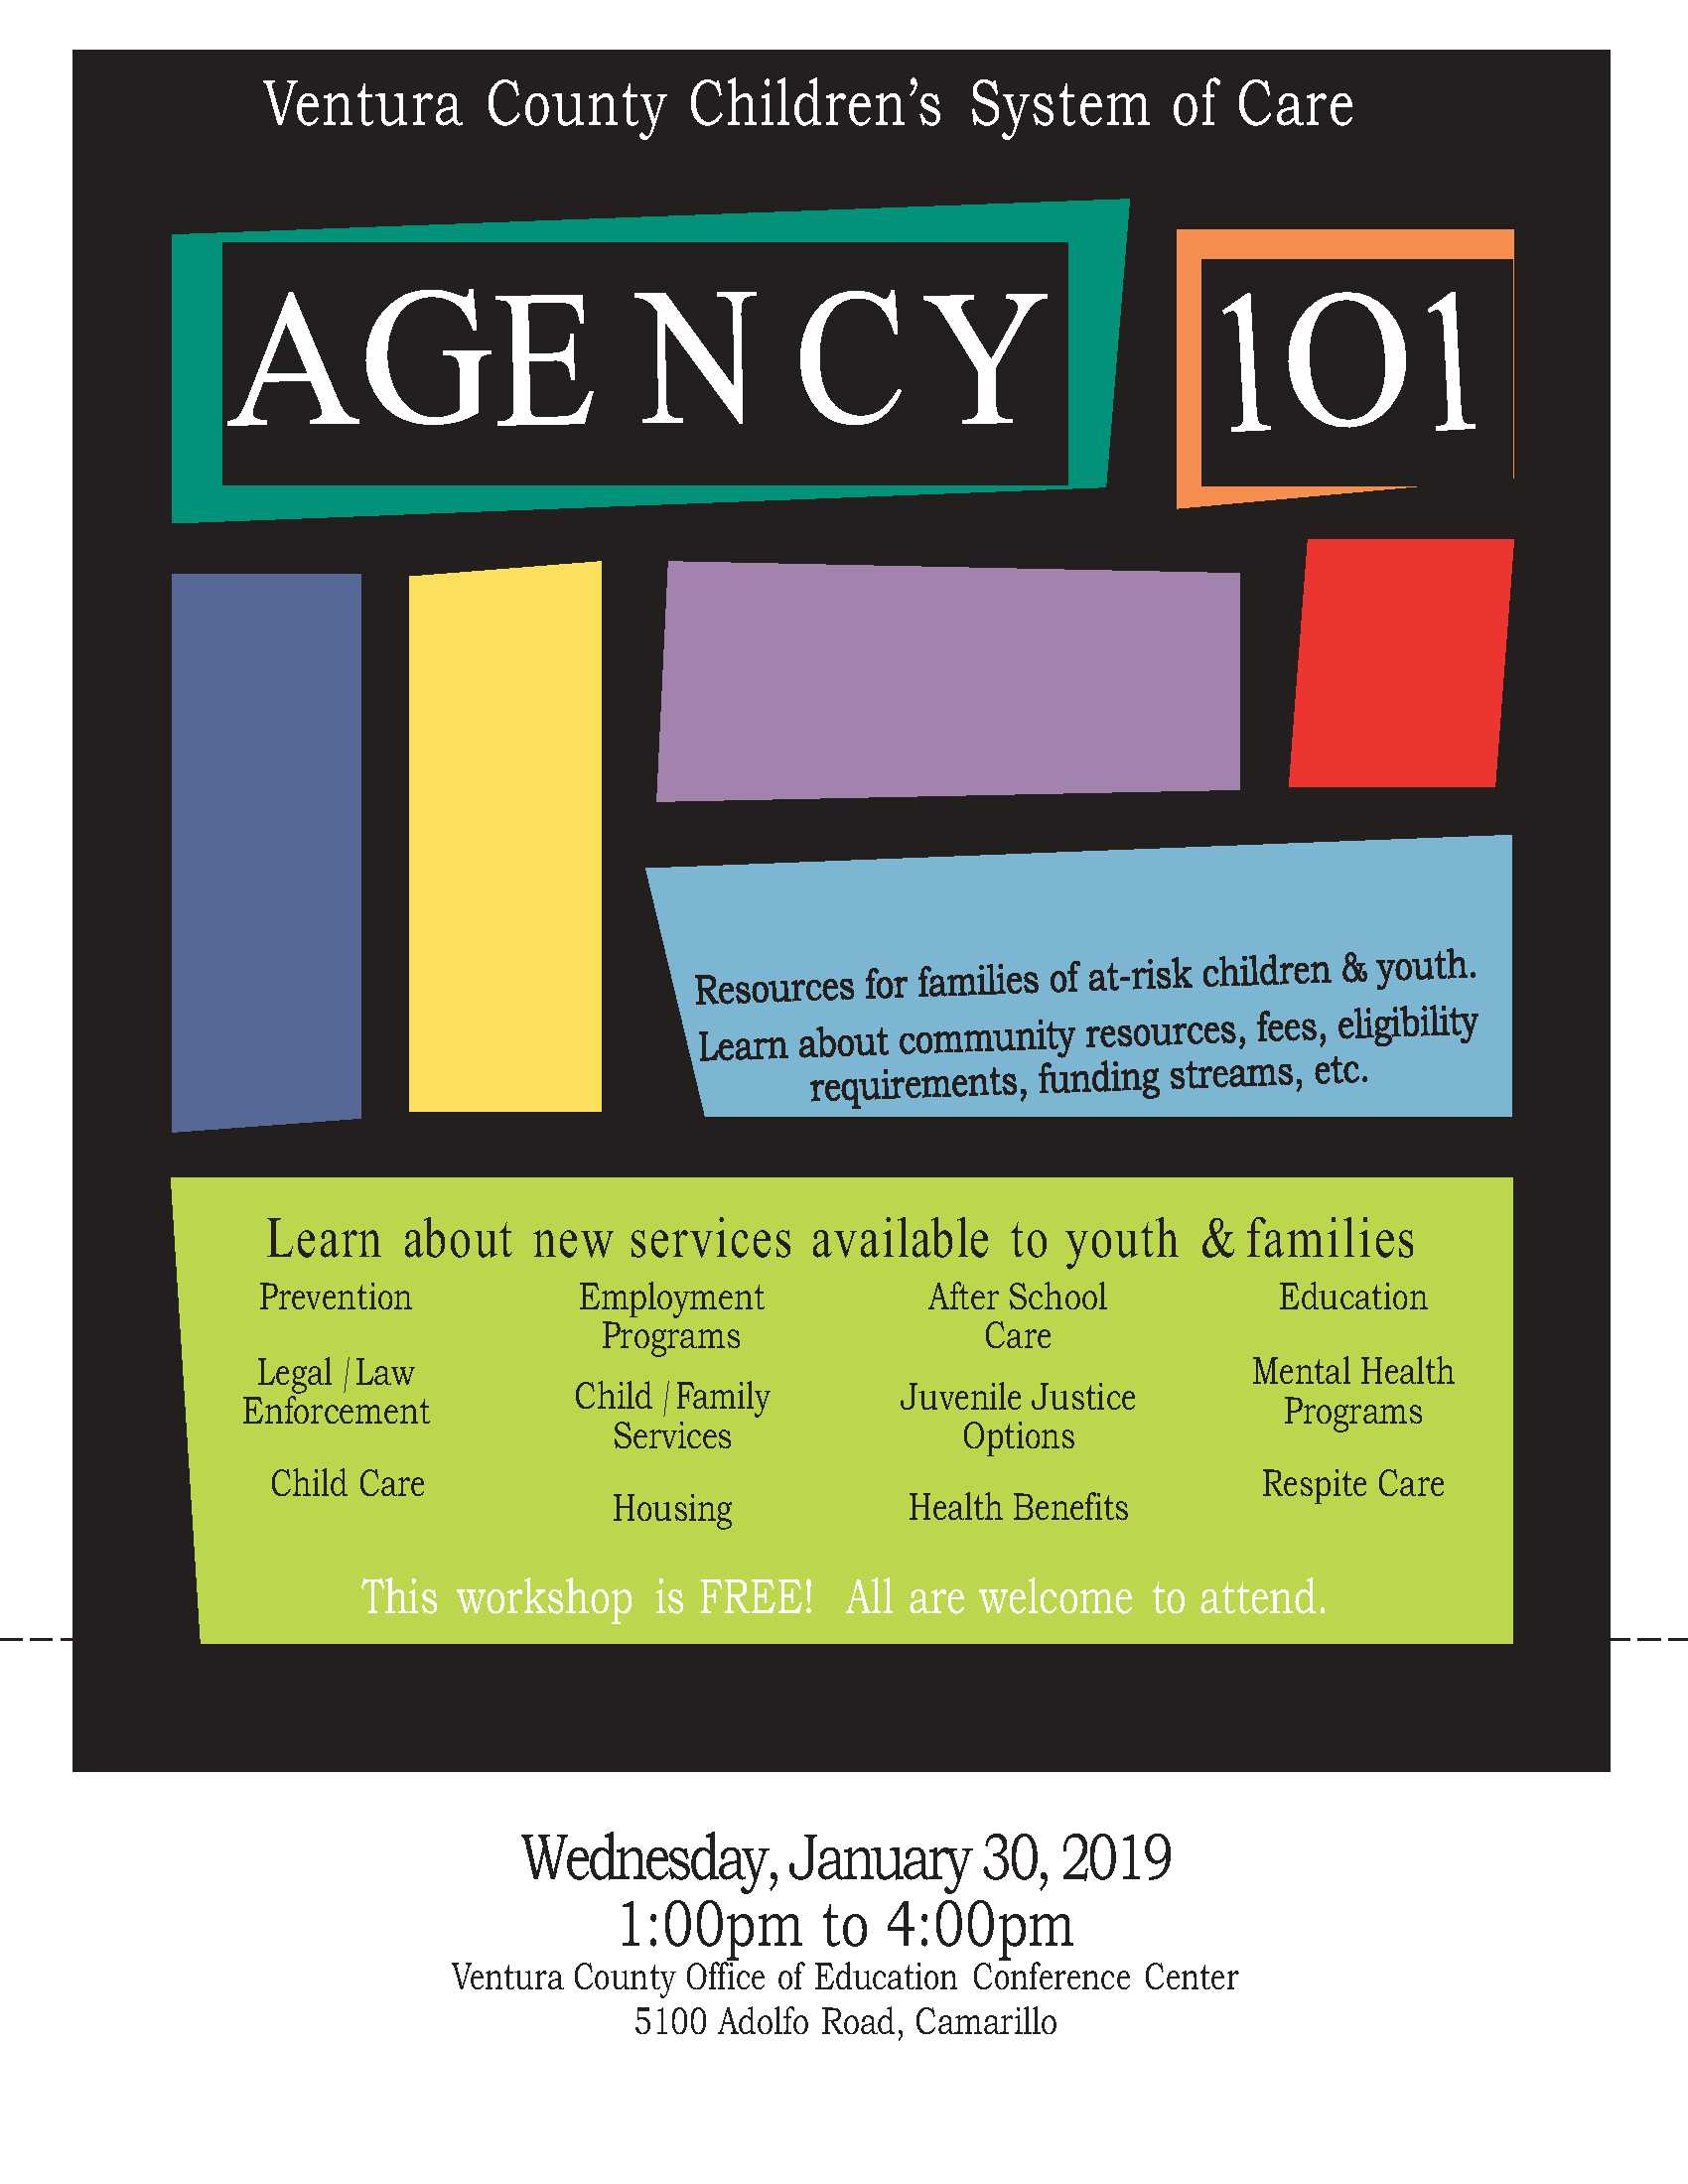 Jan 30 2019 VCOE Agency 101 Resource Fair